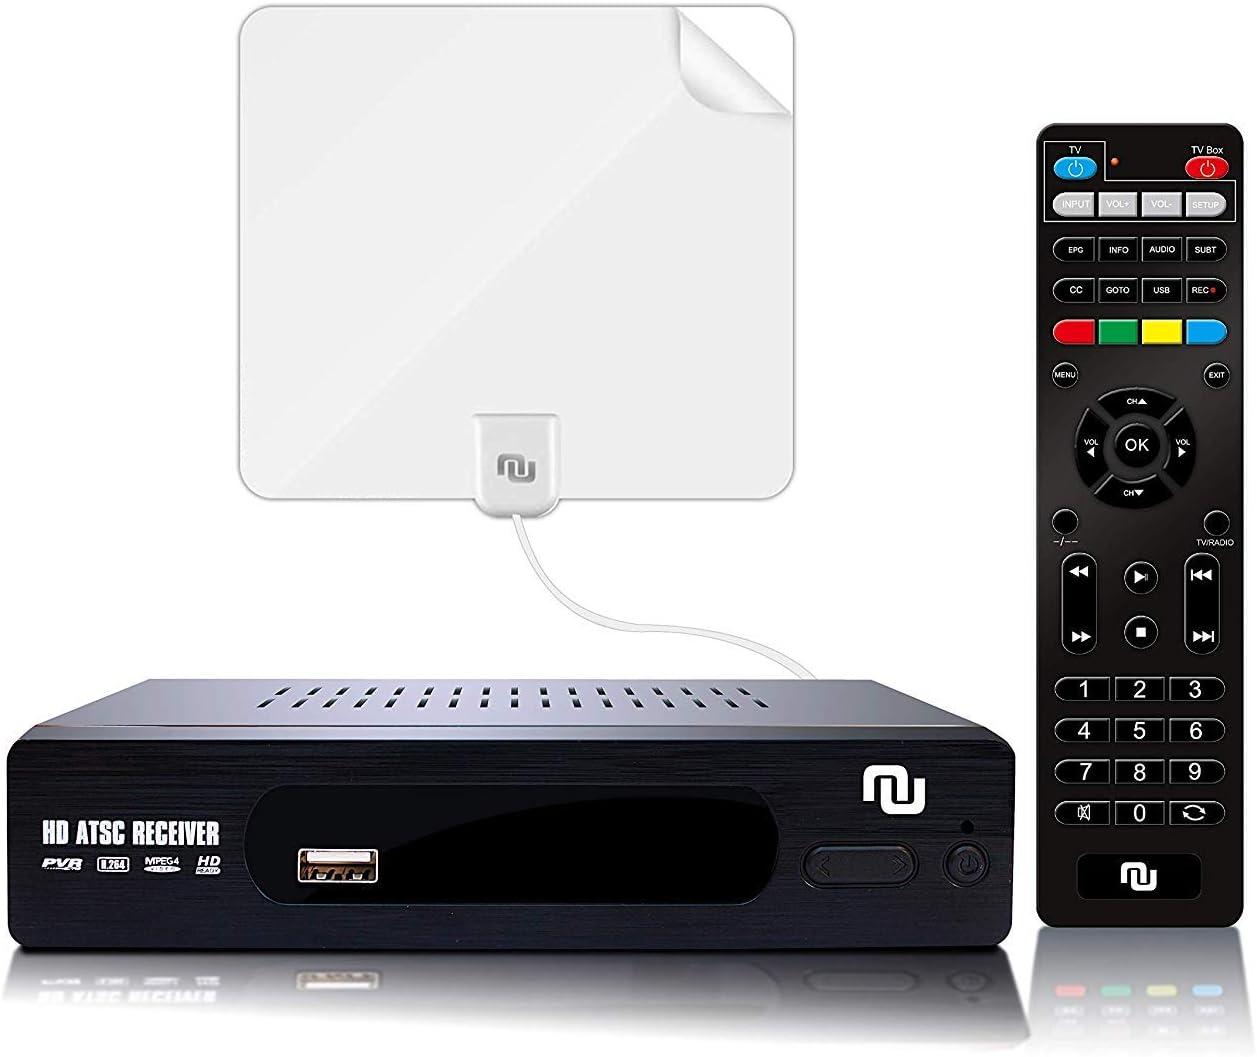 NUNET ATSC HD convertidor Digital Caja con 1080p Salida HDMI, 35 ...